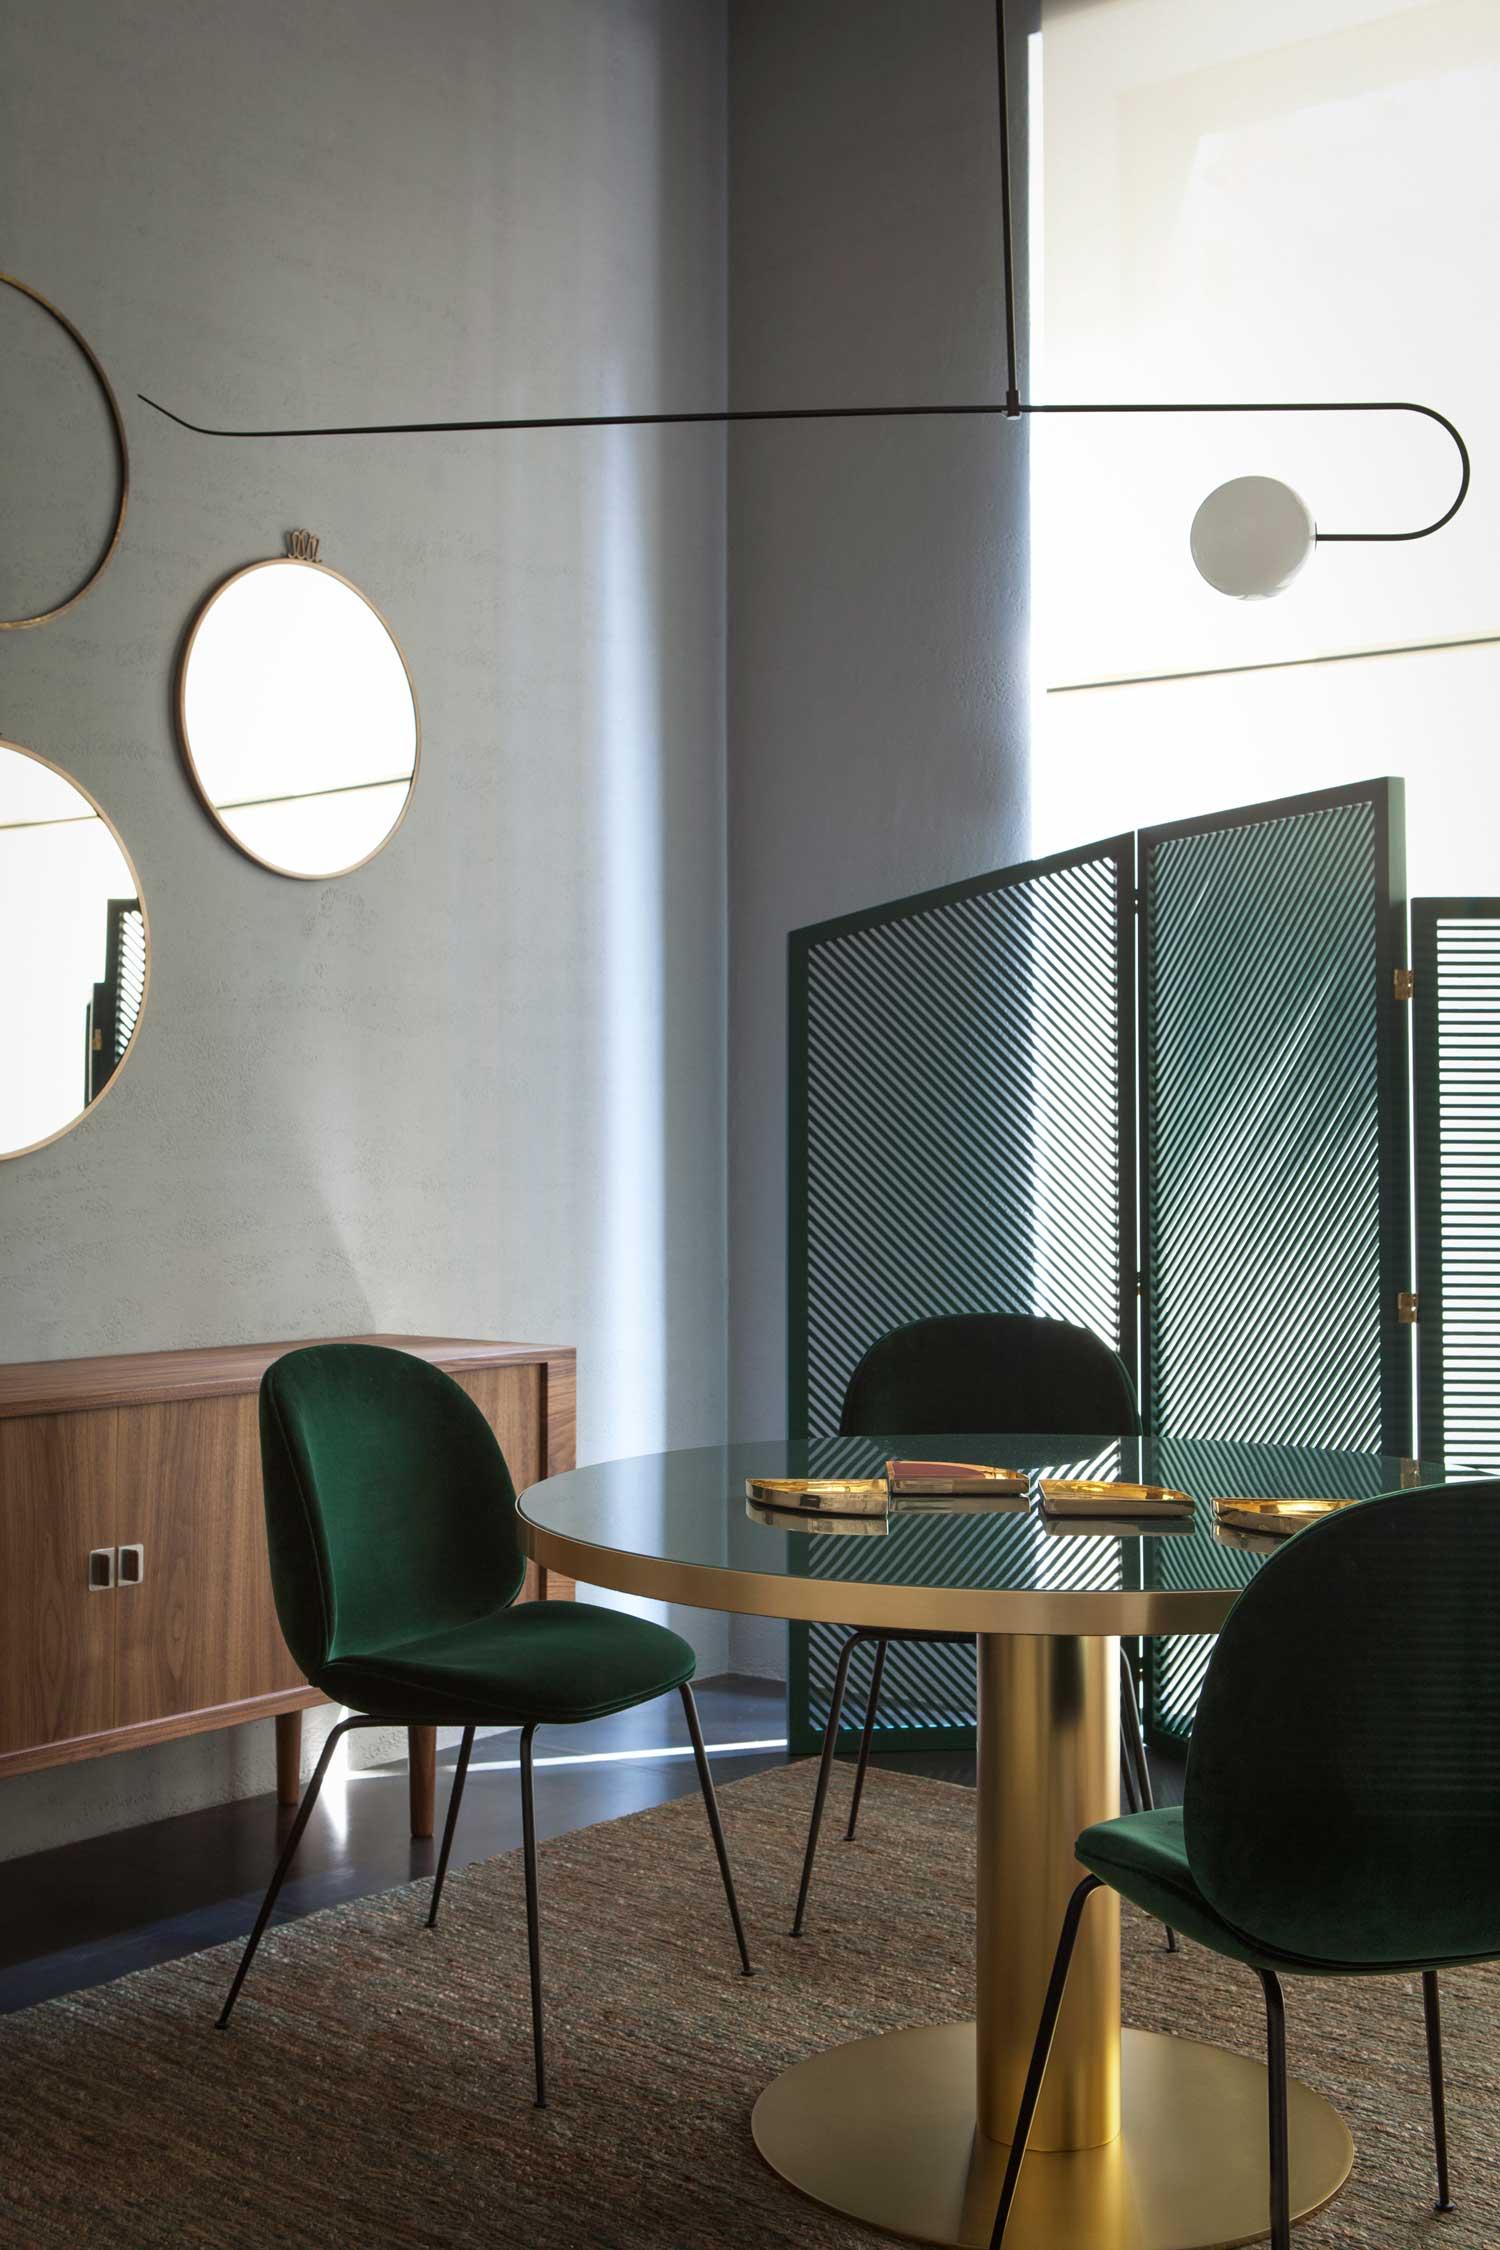 Instant Panorama By Studiopepe At Spotti Milano Yellowtrace  # Meuble Tv Murale Meuble Tv Murale Design Ronna Mobilo Design